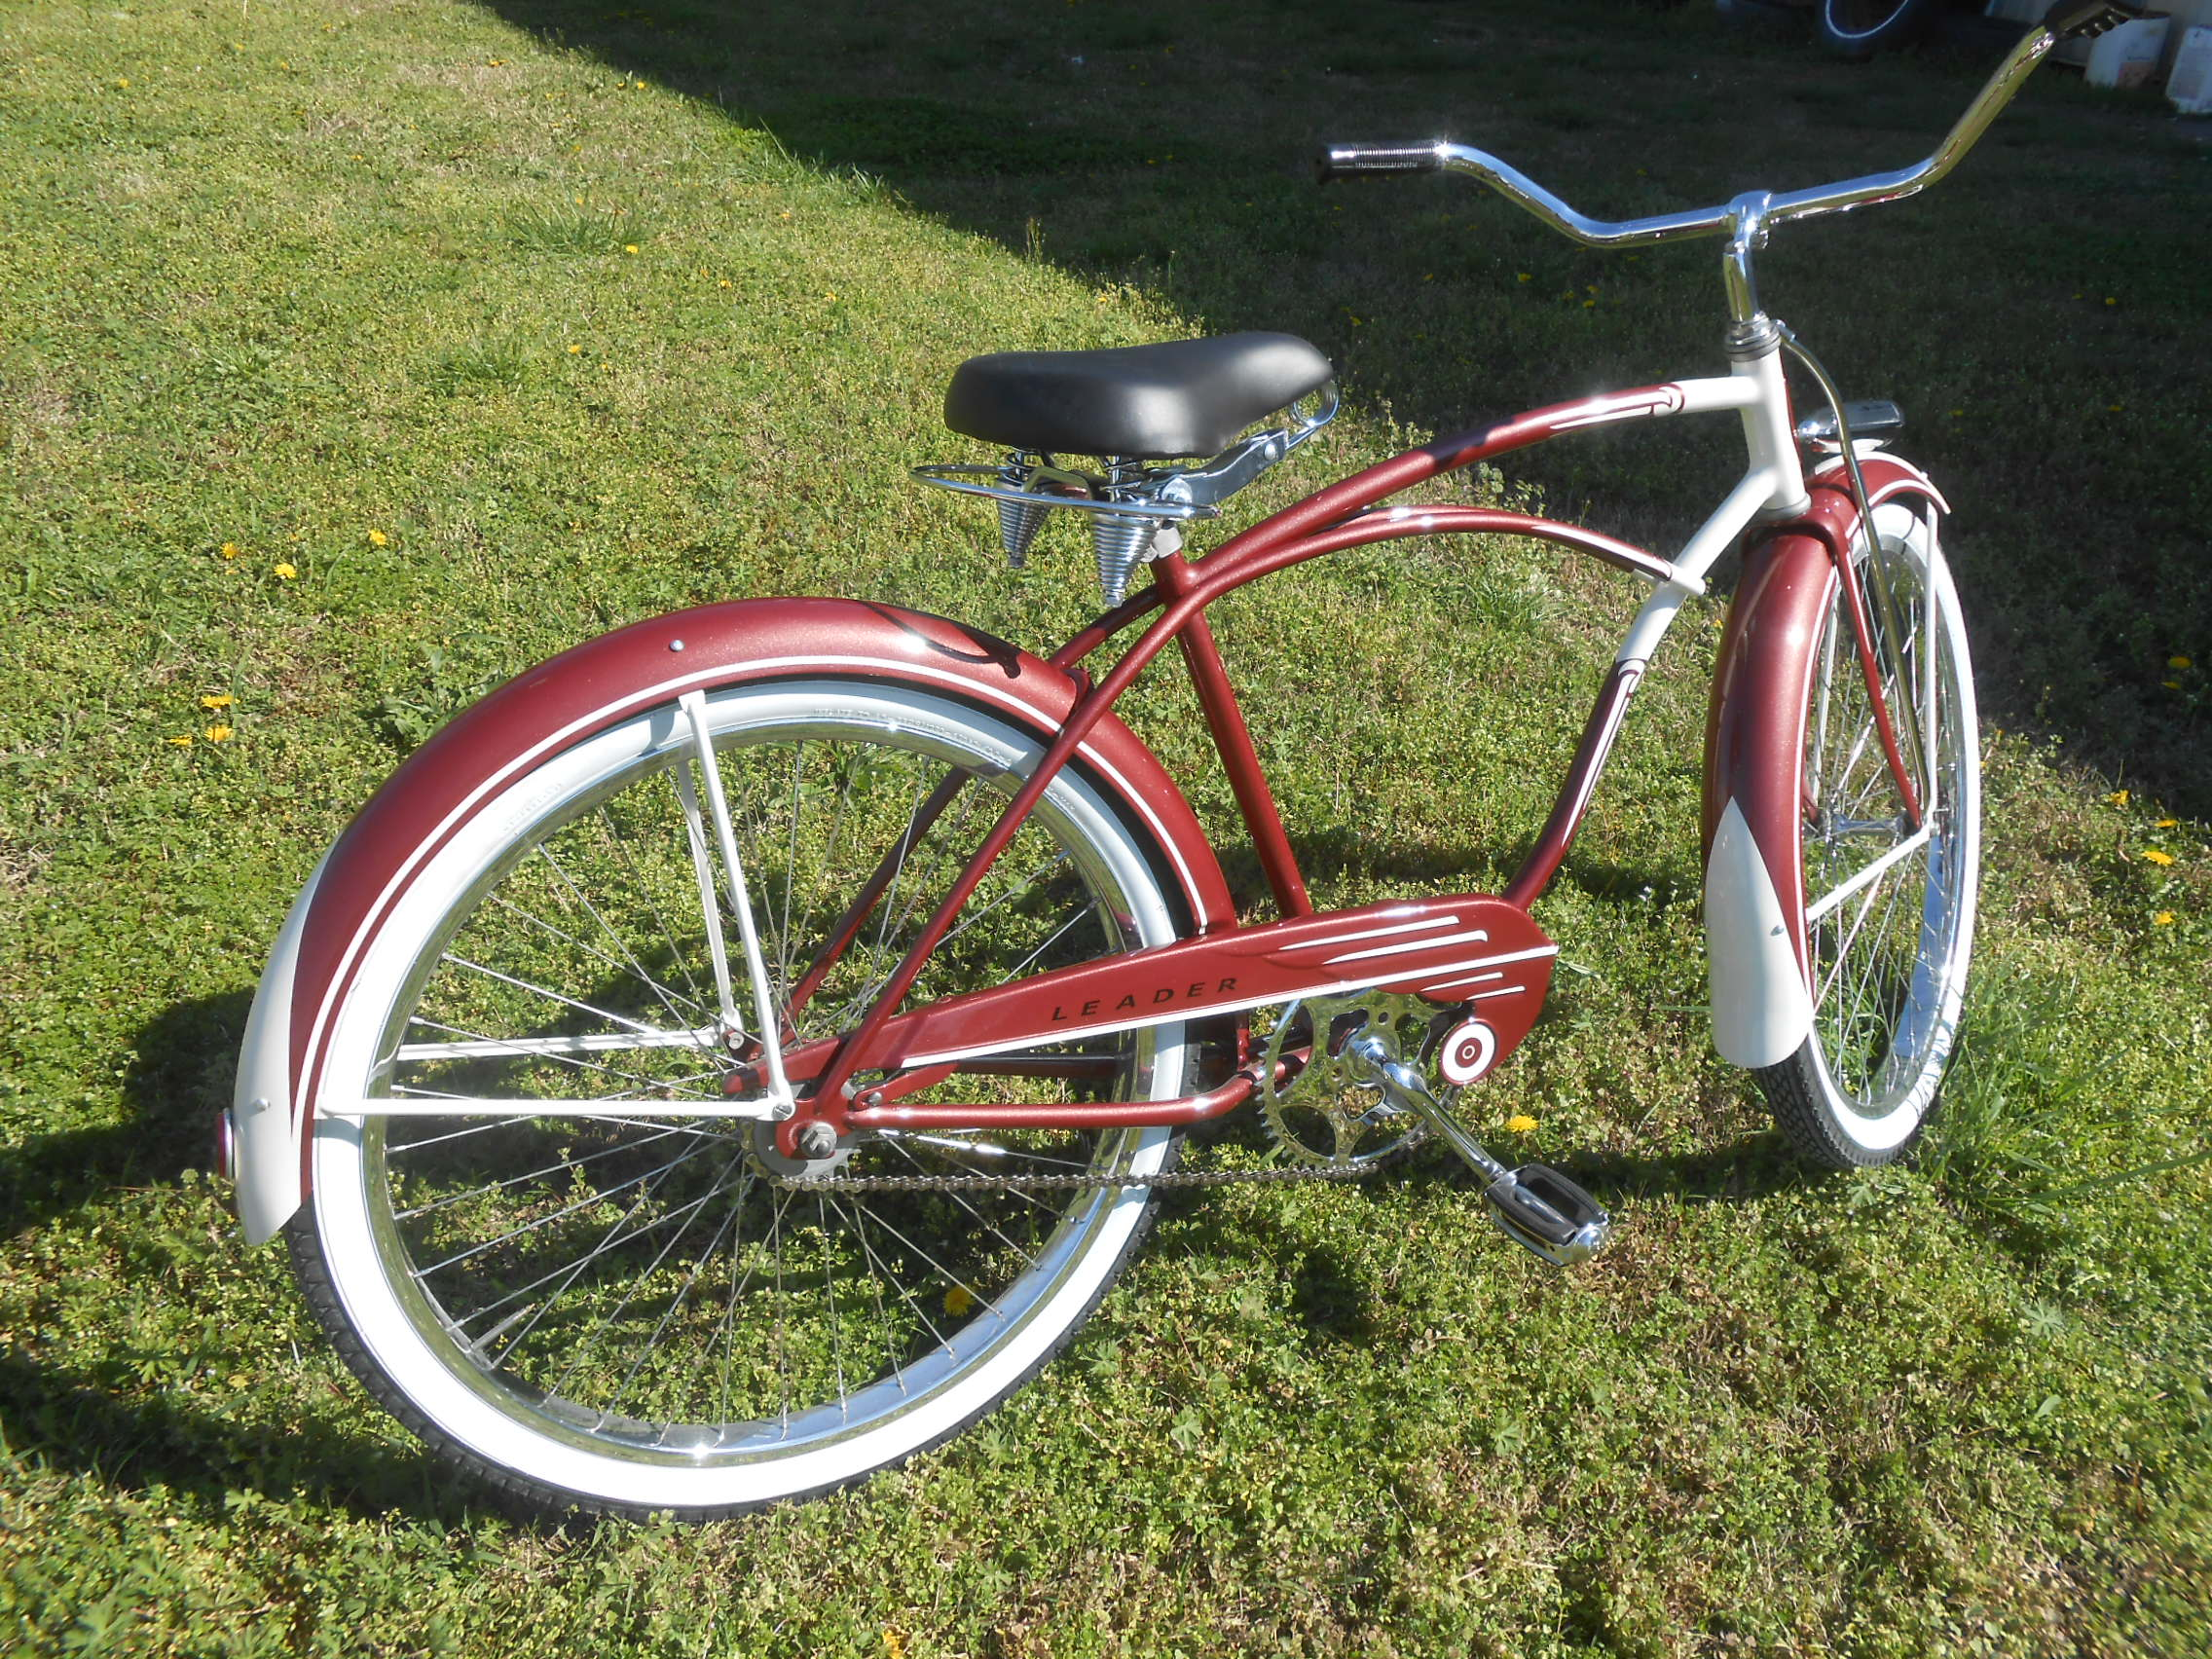 1952 Schwinn Bicycle -